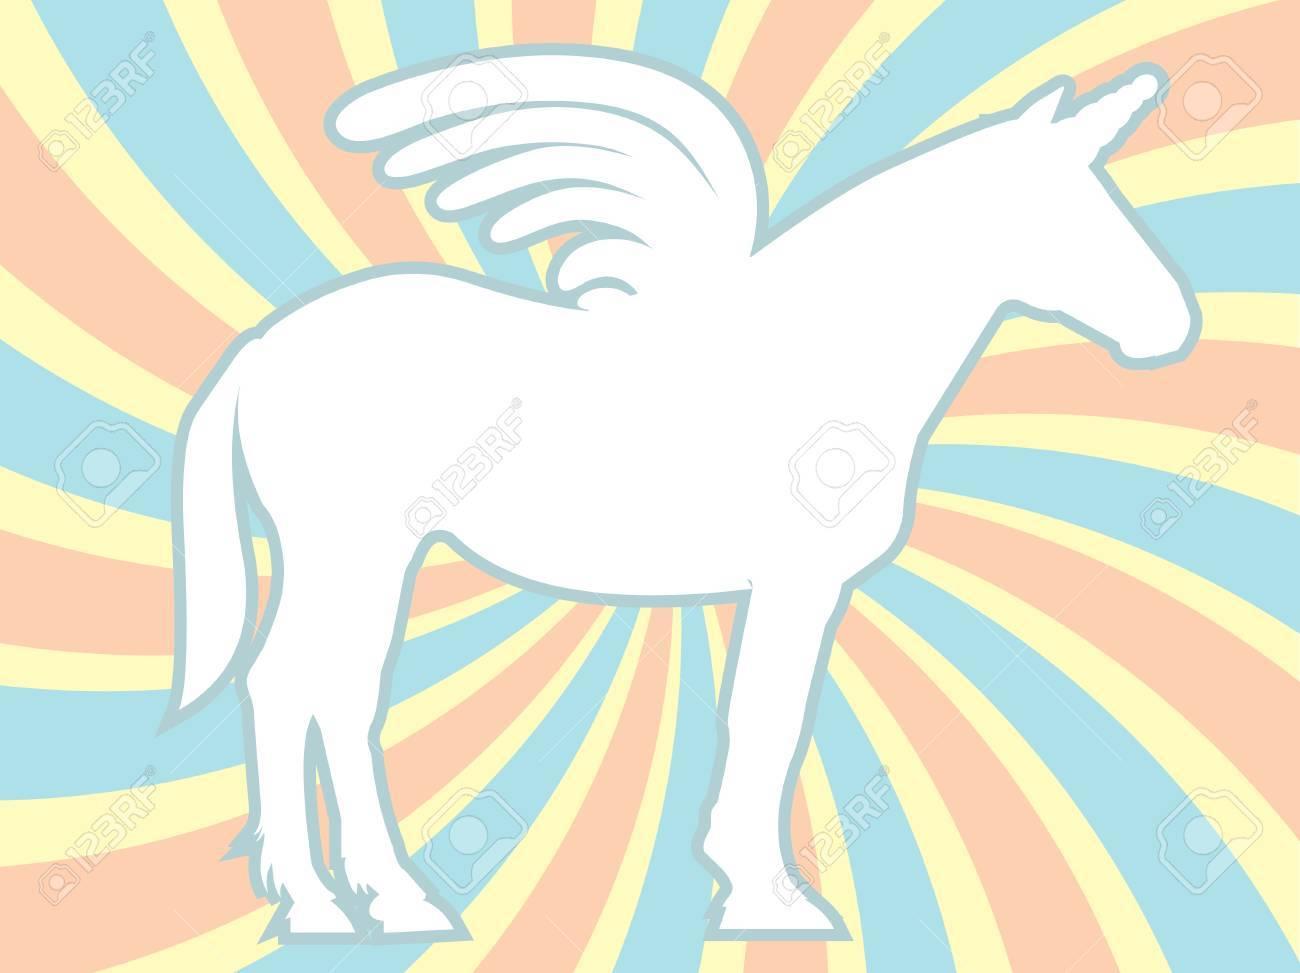 White Silhouette Unicorn Swirl Background Stock Vector - 8195244